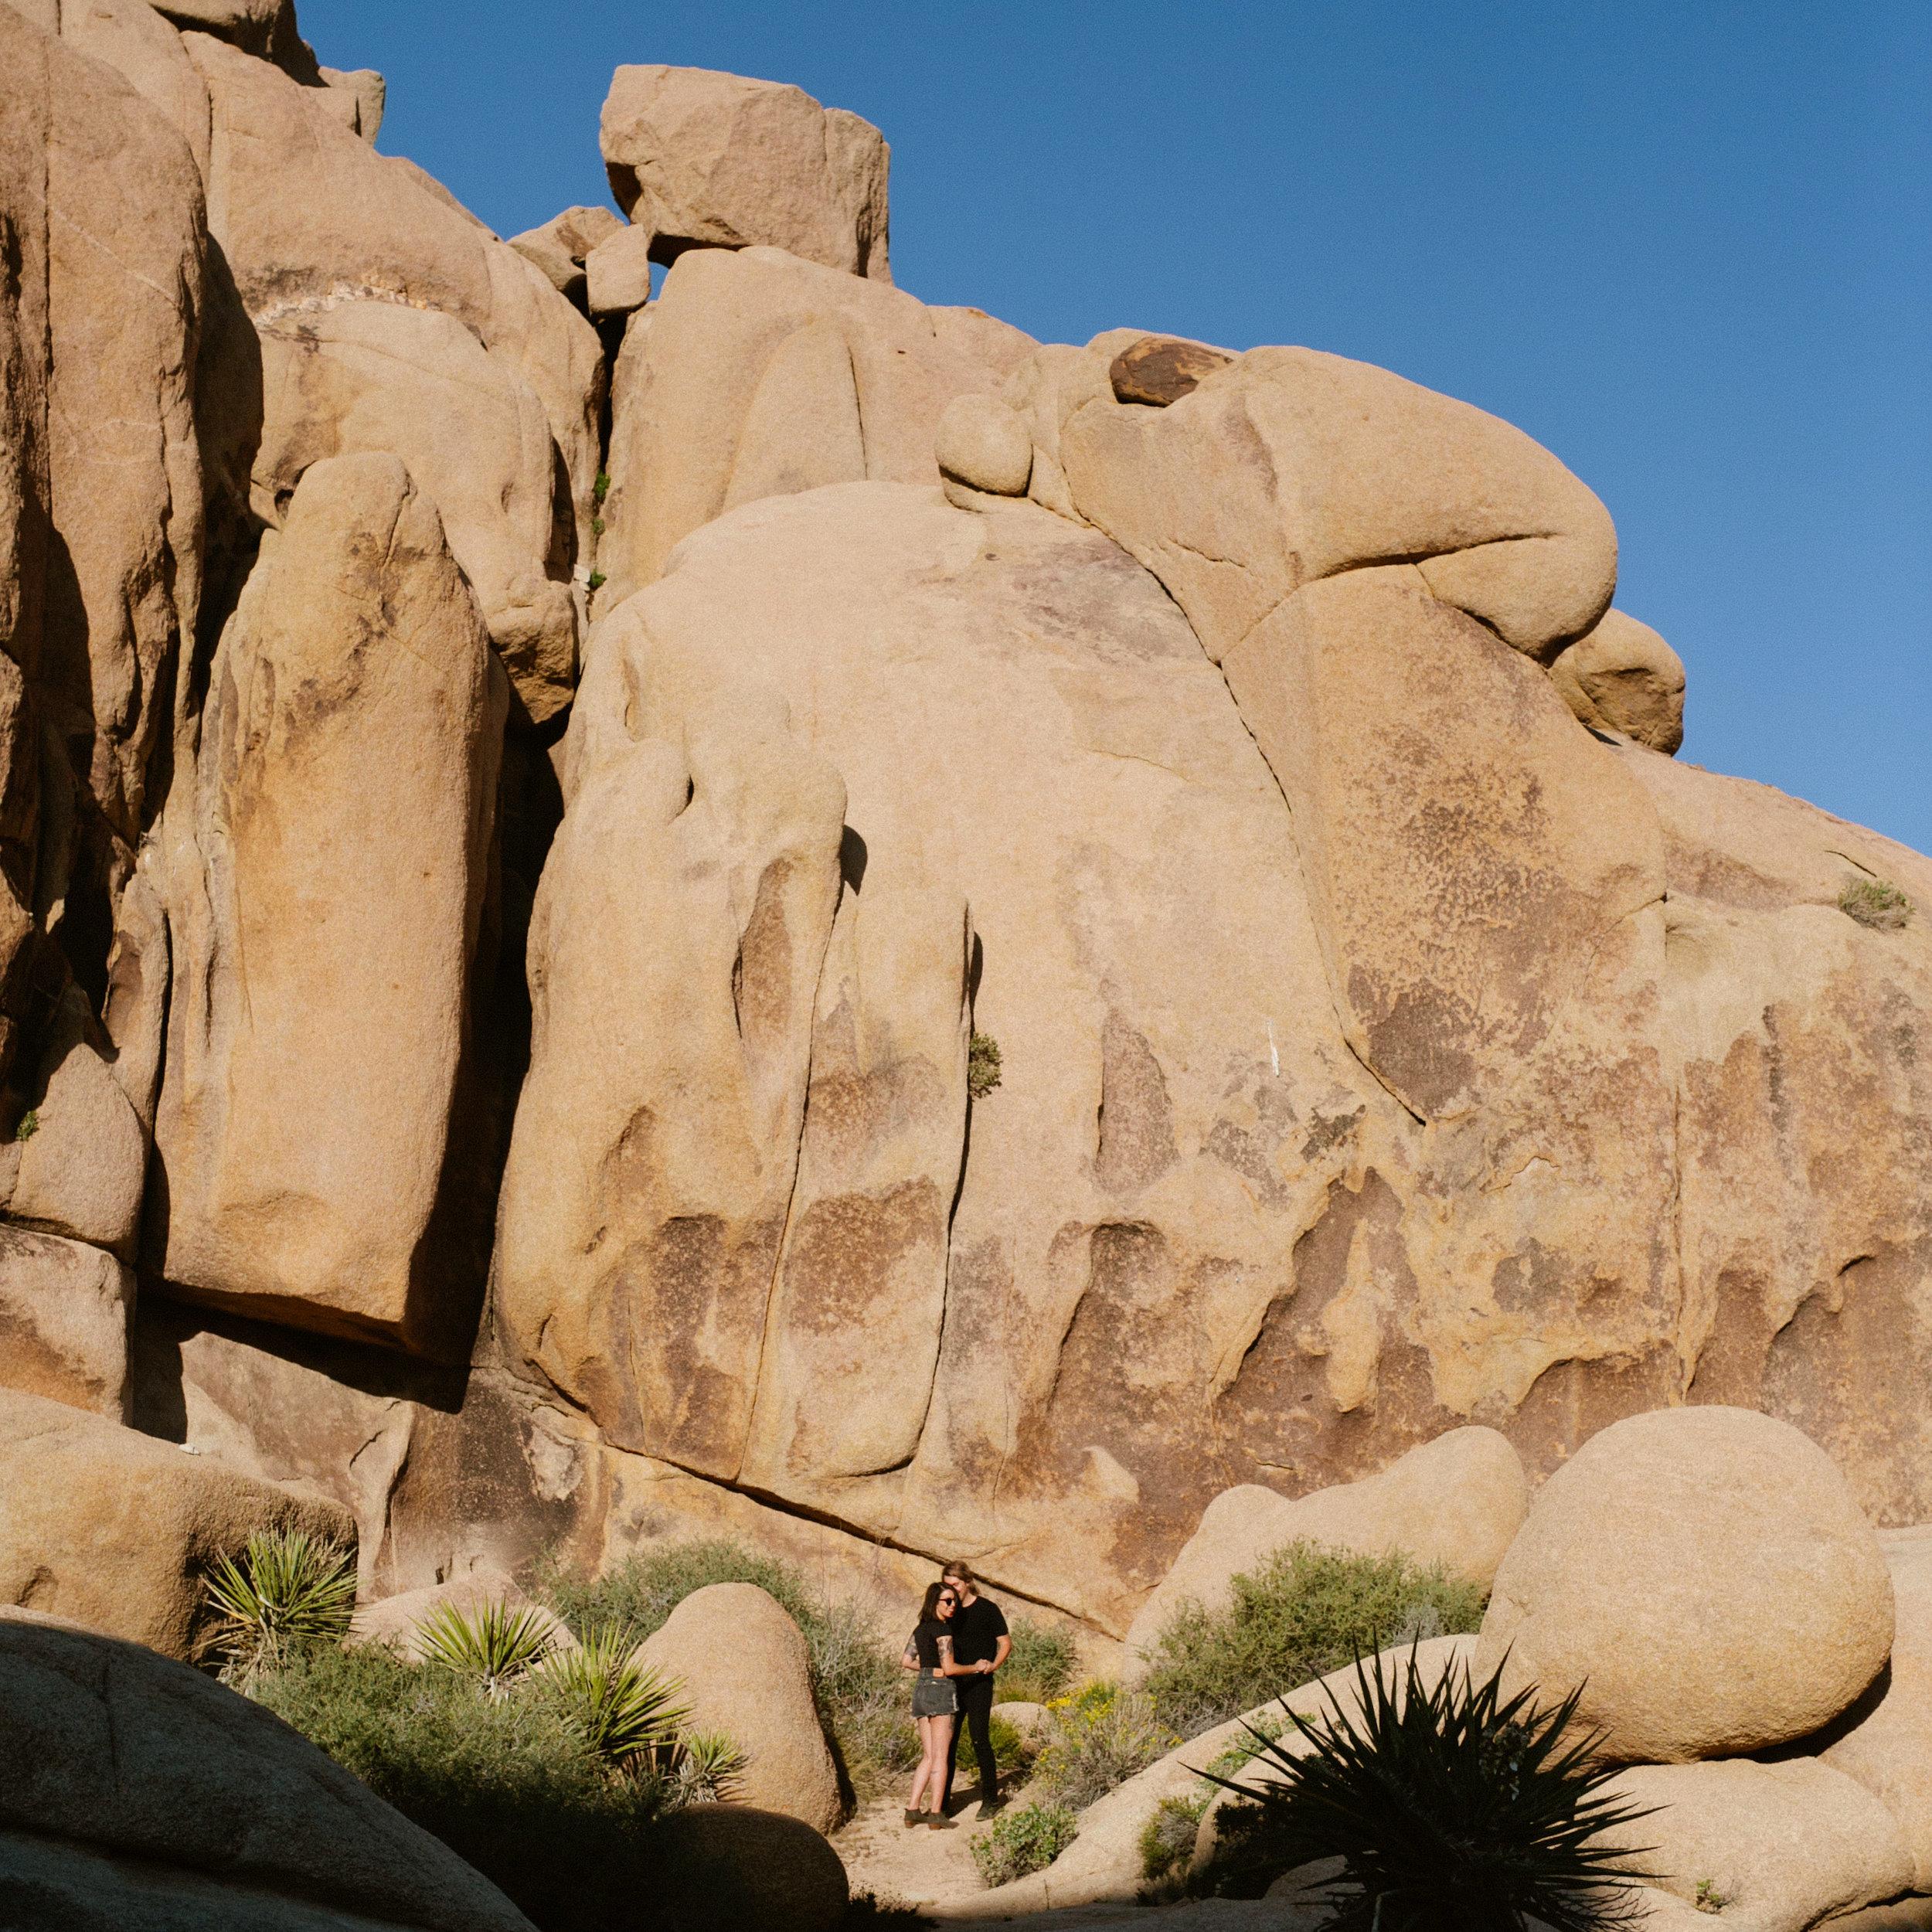 Wedding Photographer Photographers Elopement Travel Destination Romantic Bohemian Creative Traveling Photography California Desert Joshua Tree